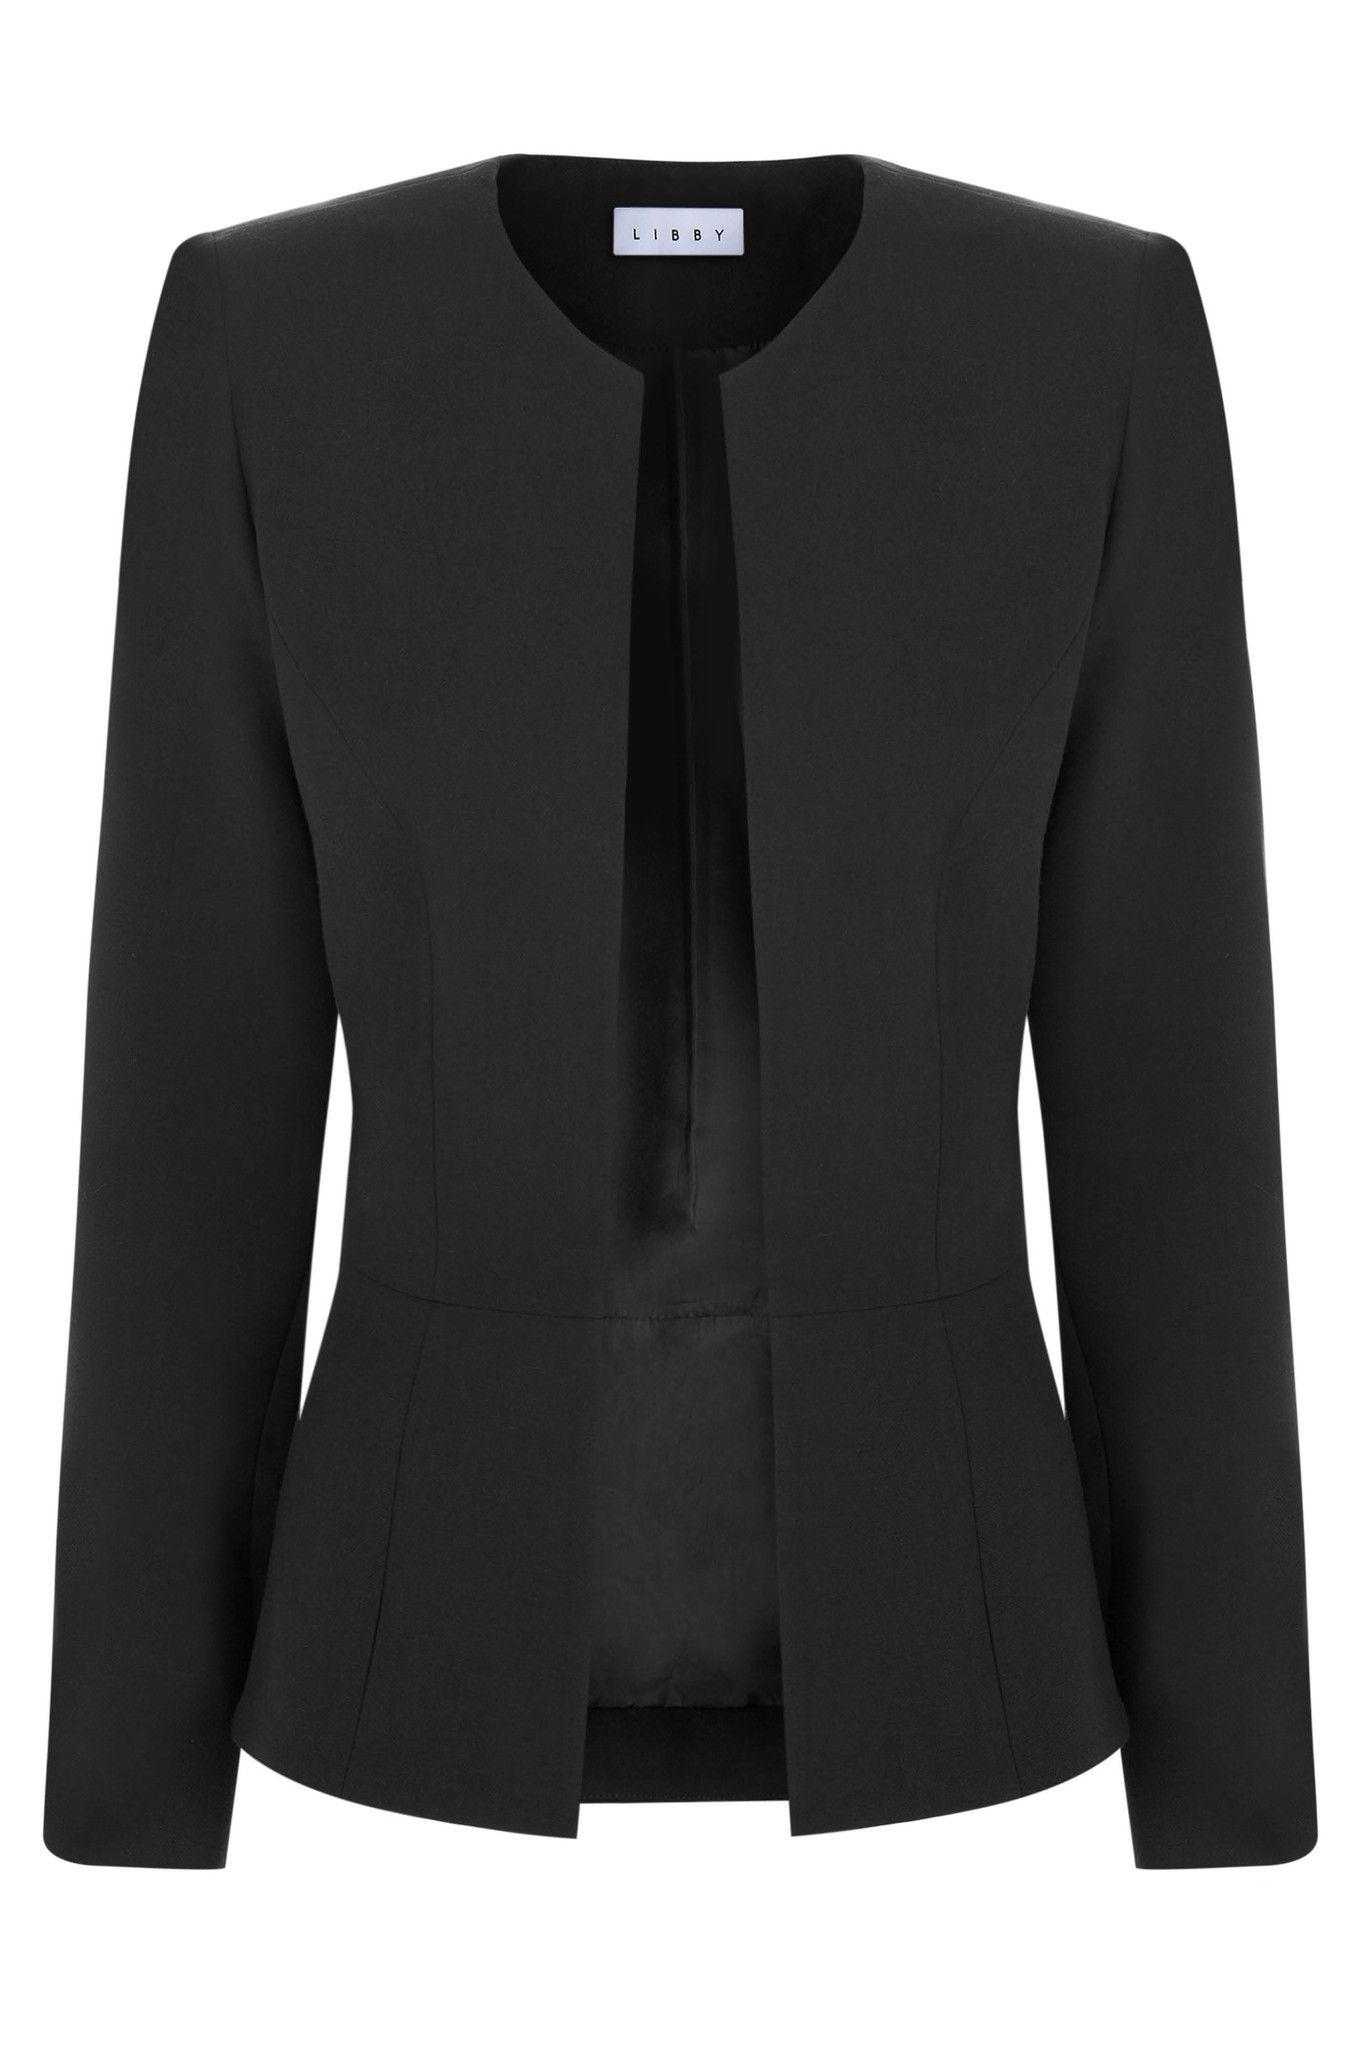 9611e7f08 Burlington Black | Blazers | Libby london, Jackets, Black